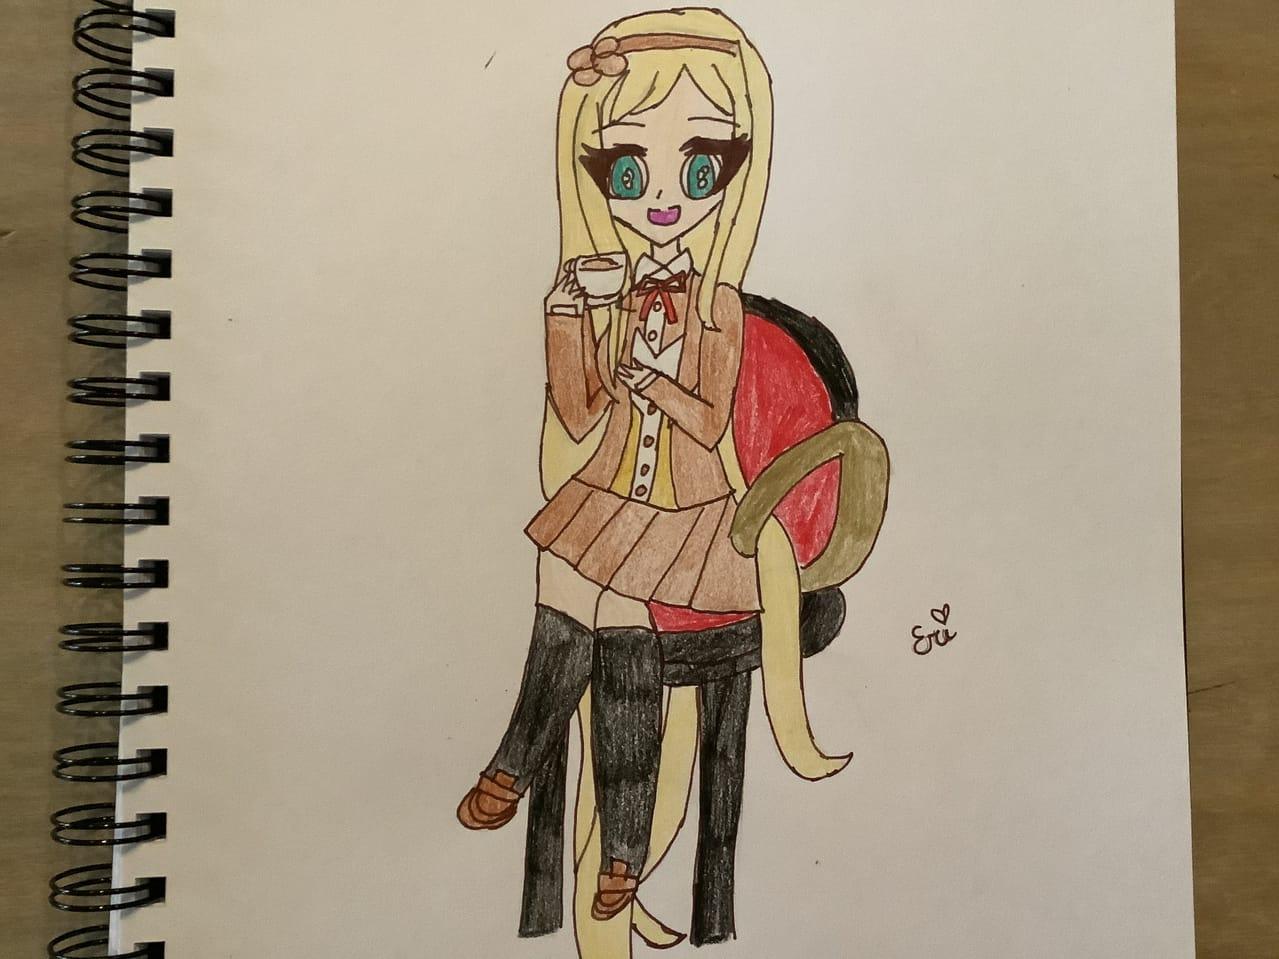 ☕️ Illust of Ɛɾì (ӄɨʏօӄօ Mσԃҽ)©️ animegirl ultimateprincess fanart chair Danganronpa superdanganronpa2 princess sonianevermind despair tea